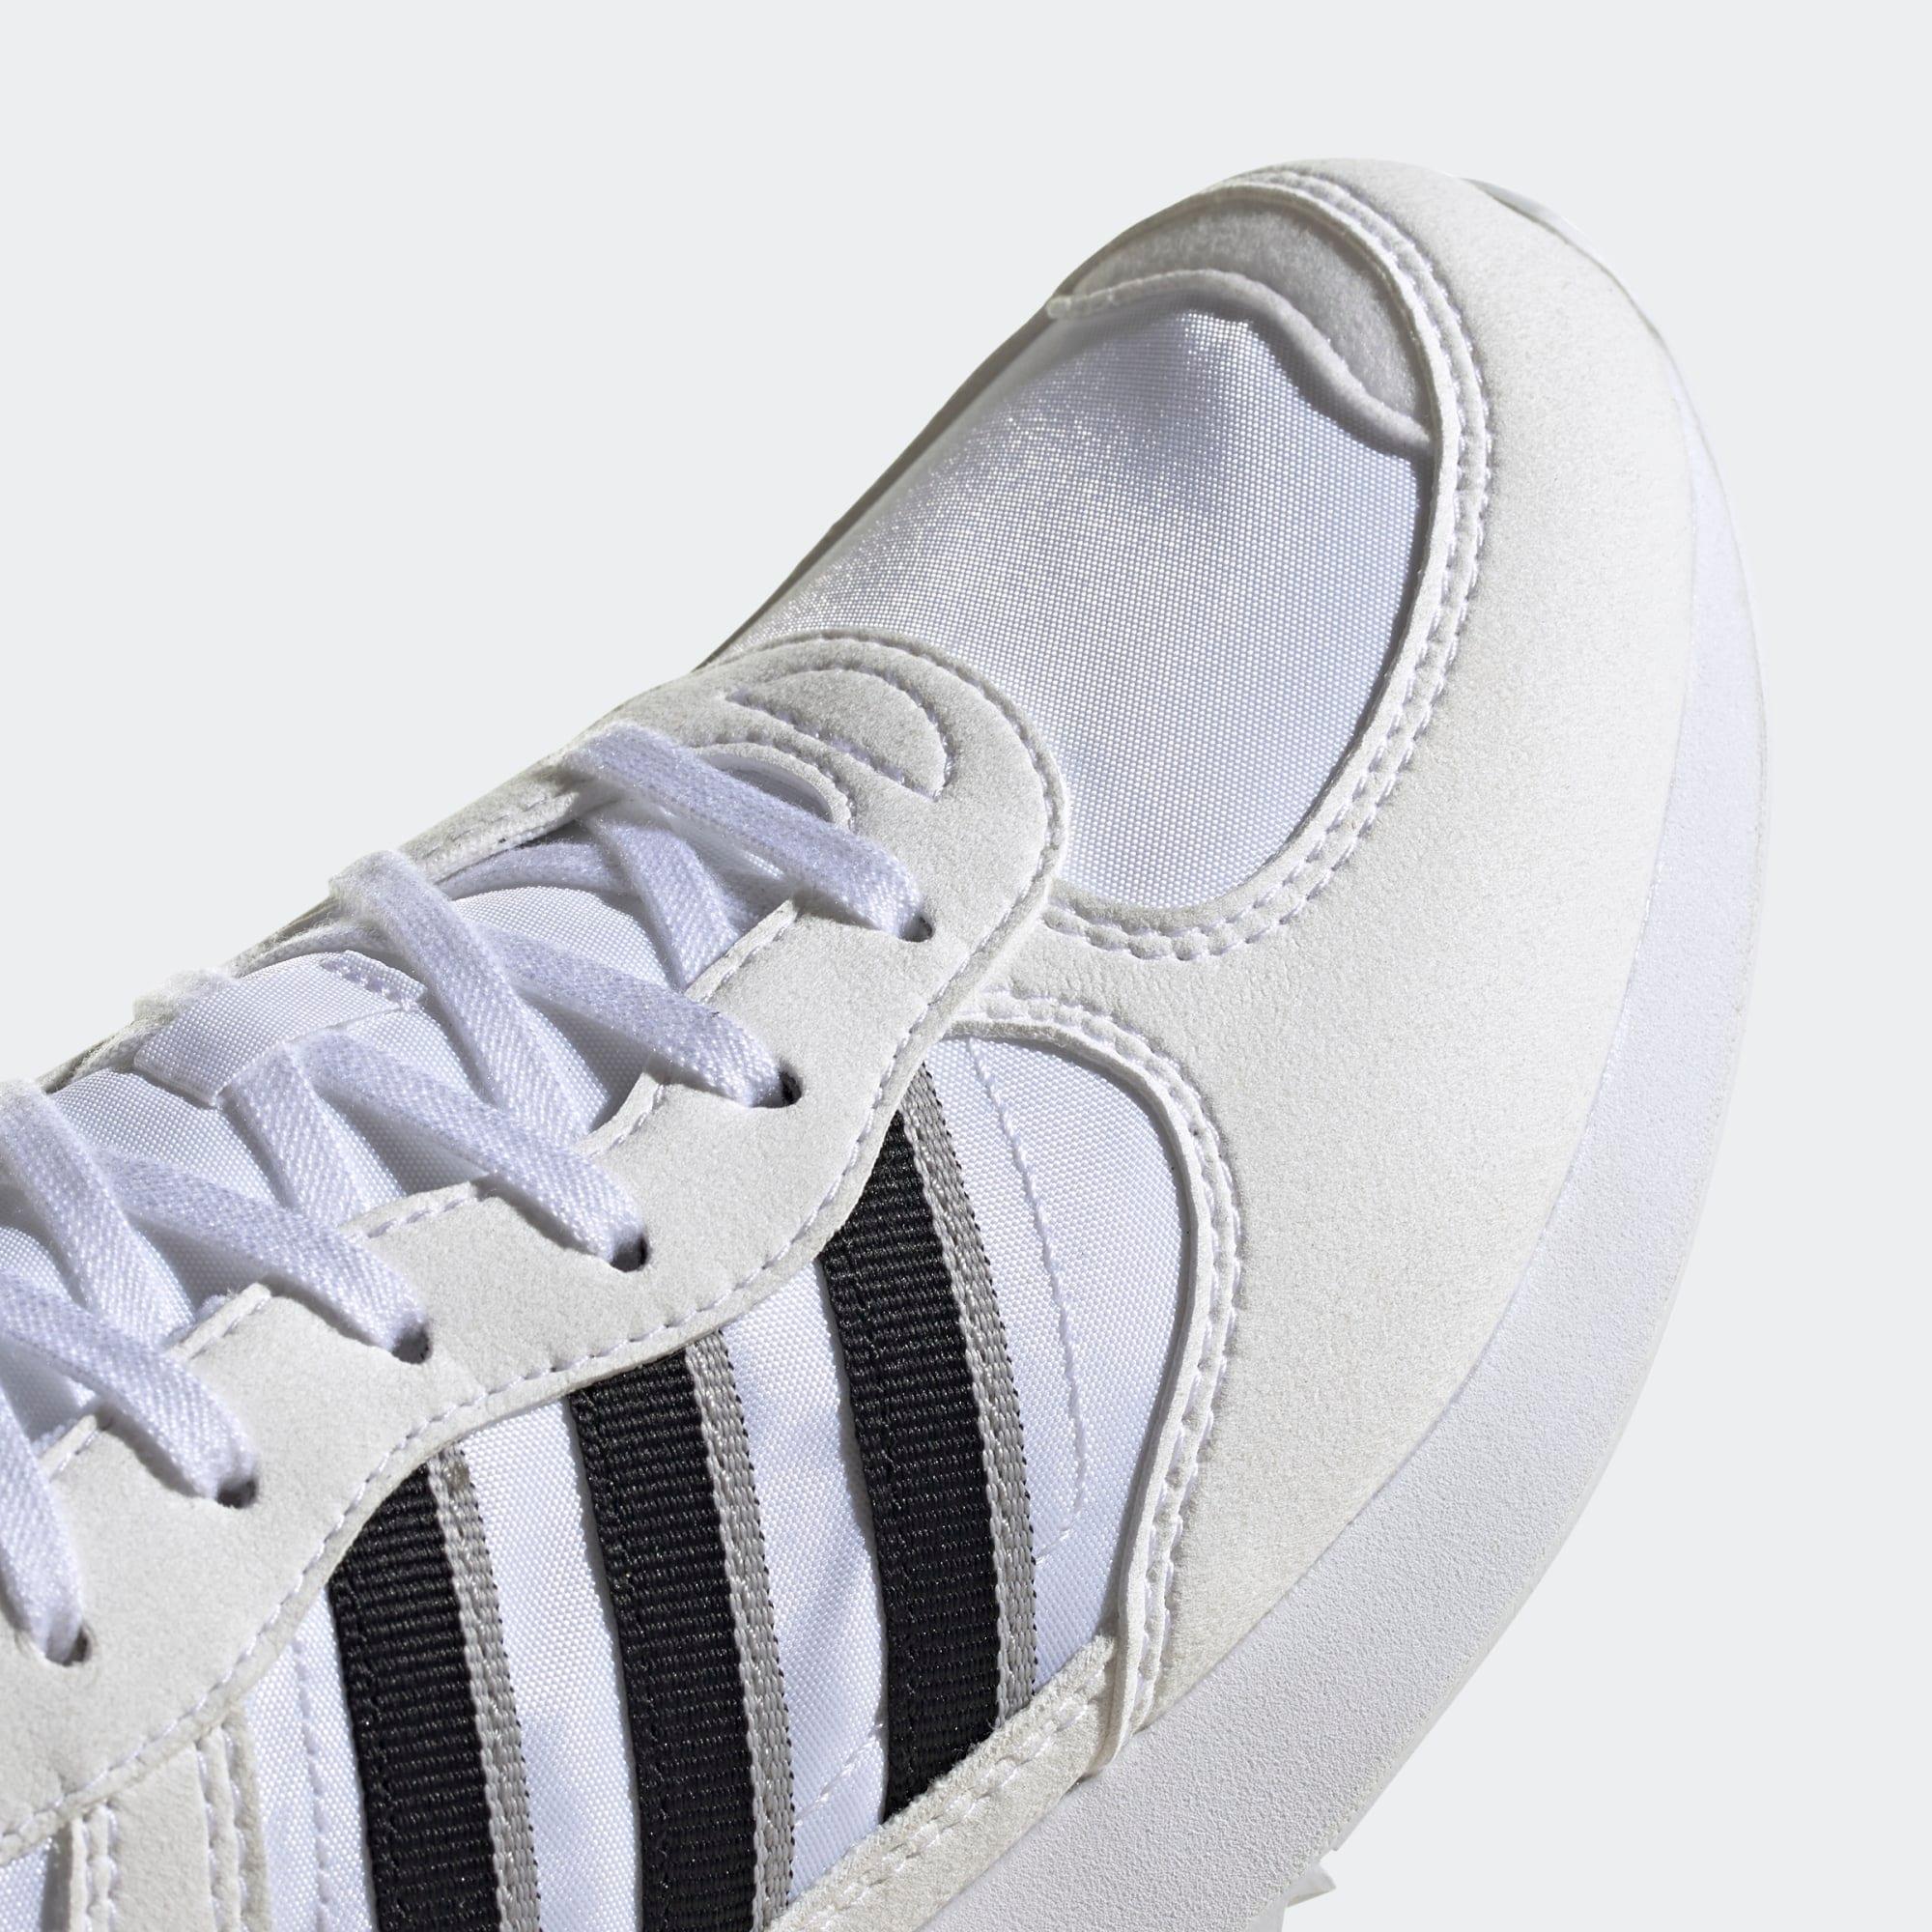 ADIDAS ORIGINALS Nízke tenisky 'Special 21'  čierna / biela ako vlna / šedobiela.